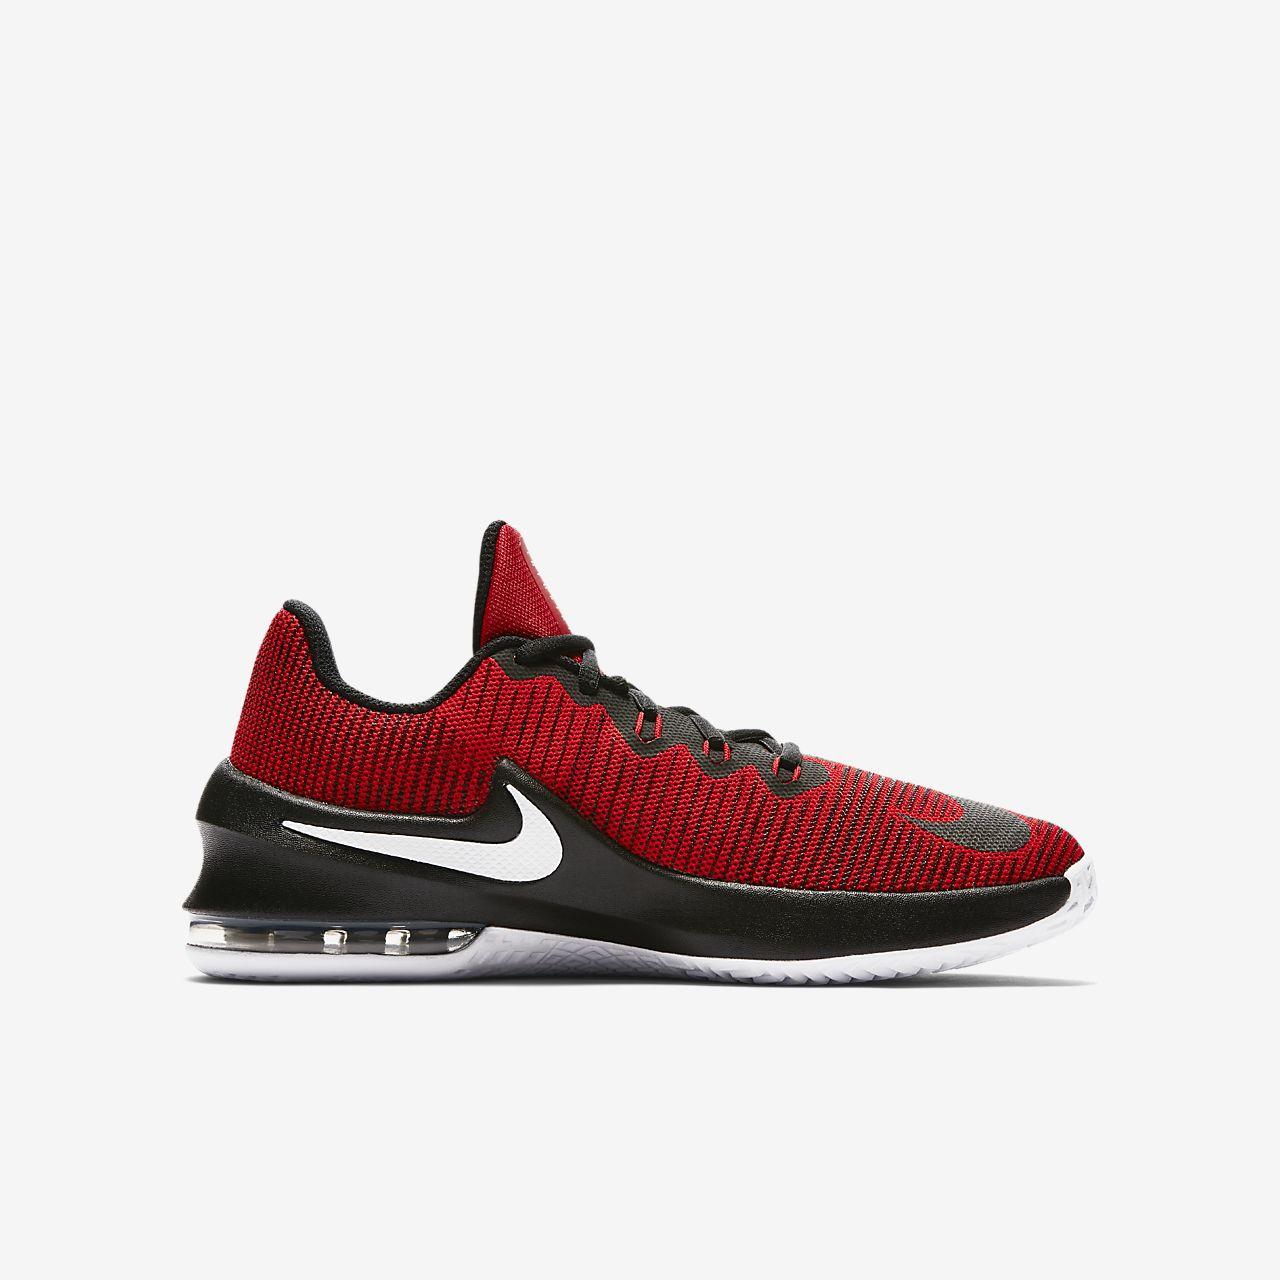 Chaussures Nike Air Max Infuriate vertes garçon Padders Poem Converse All Star Hi jMkD3whL7